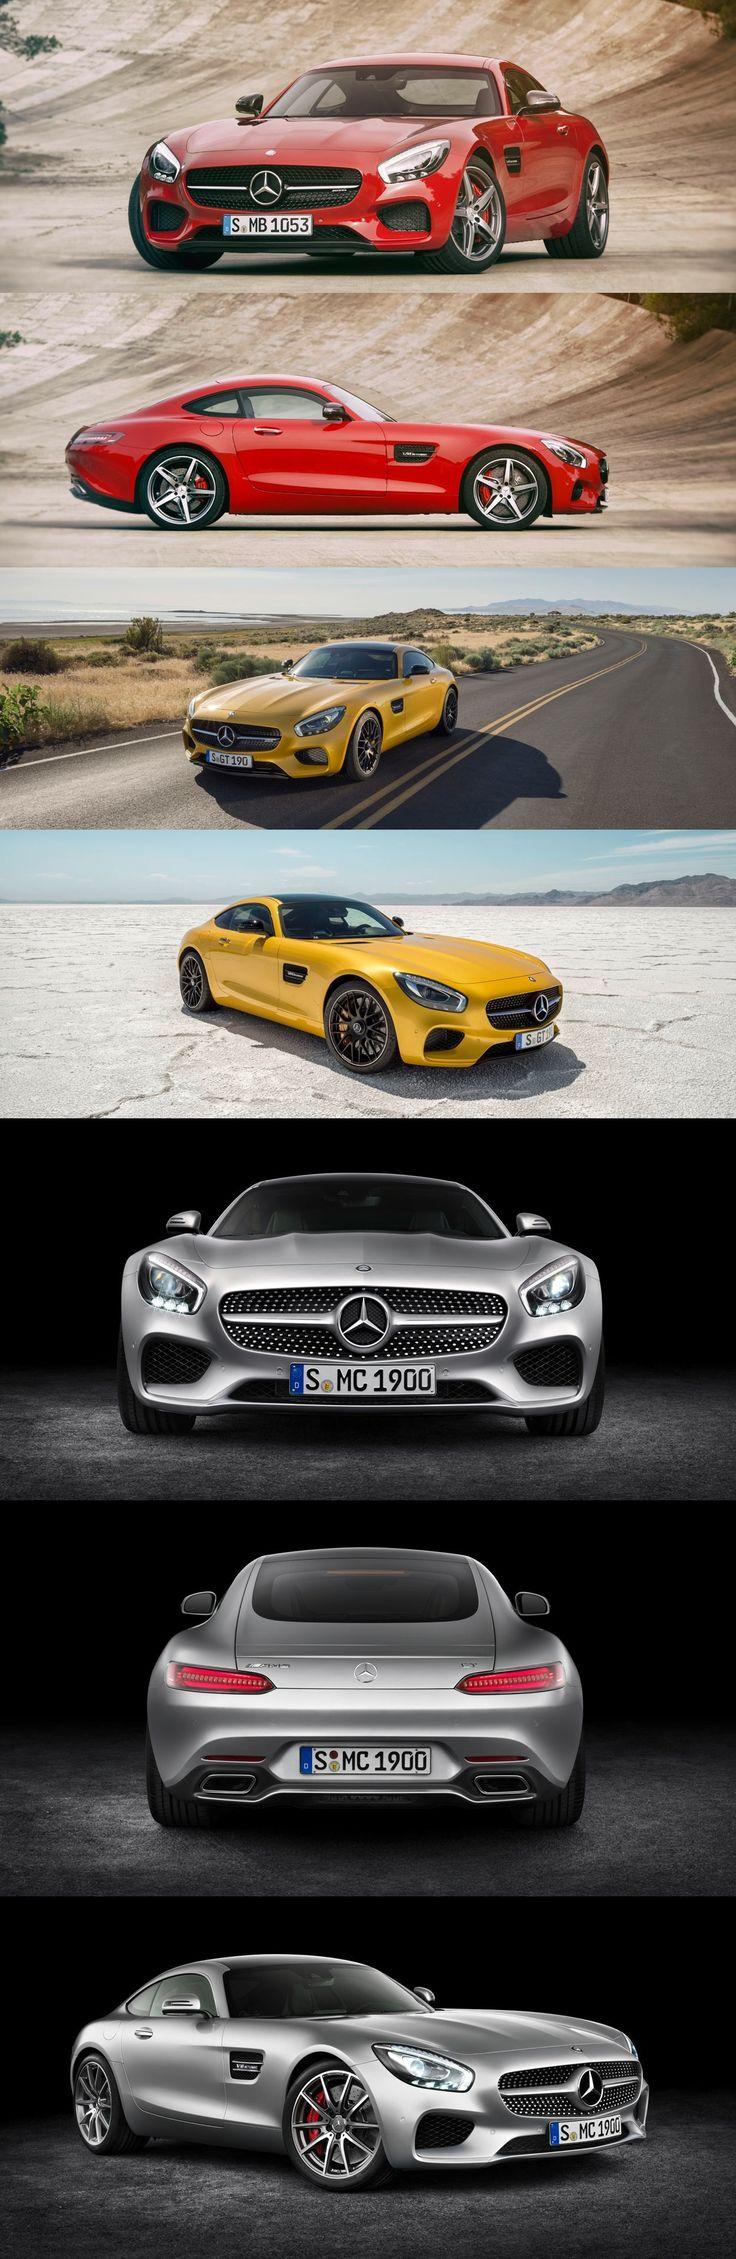 2016 Mercedes-Benz AMG GT ✏✏✏✏✏✏✏✏✏✏✏✏✏✏✏✏ AUTRES VEHICULES - OTHER VEHICLES   ☞ https://fr.pinterest.com/barbierjeanf/pin-index-voitures-v%C3%A9hicules/ ══════════════════════  BIJOUX  ☞ https://www.facebook.com/media/set/?set=a.1351591571533839&type=1&l=bb0129771f ✏✏✏✏✏✏✏✏✏✏✏✏✏✏✏✏